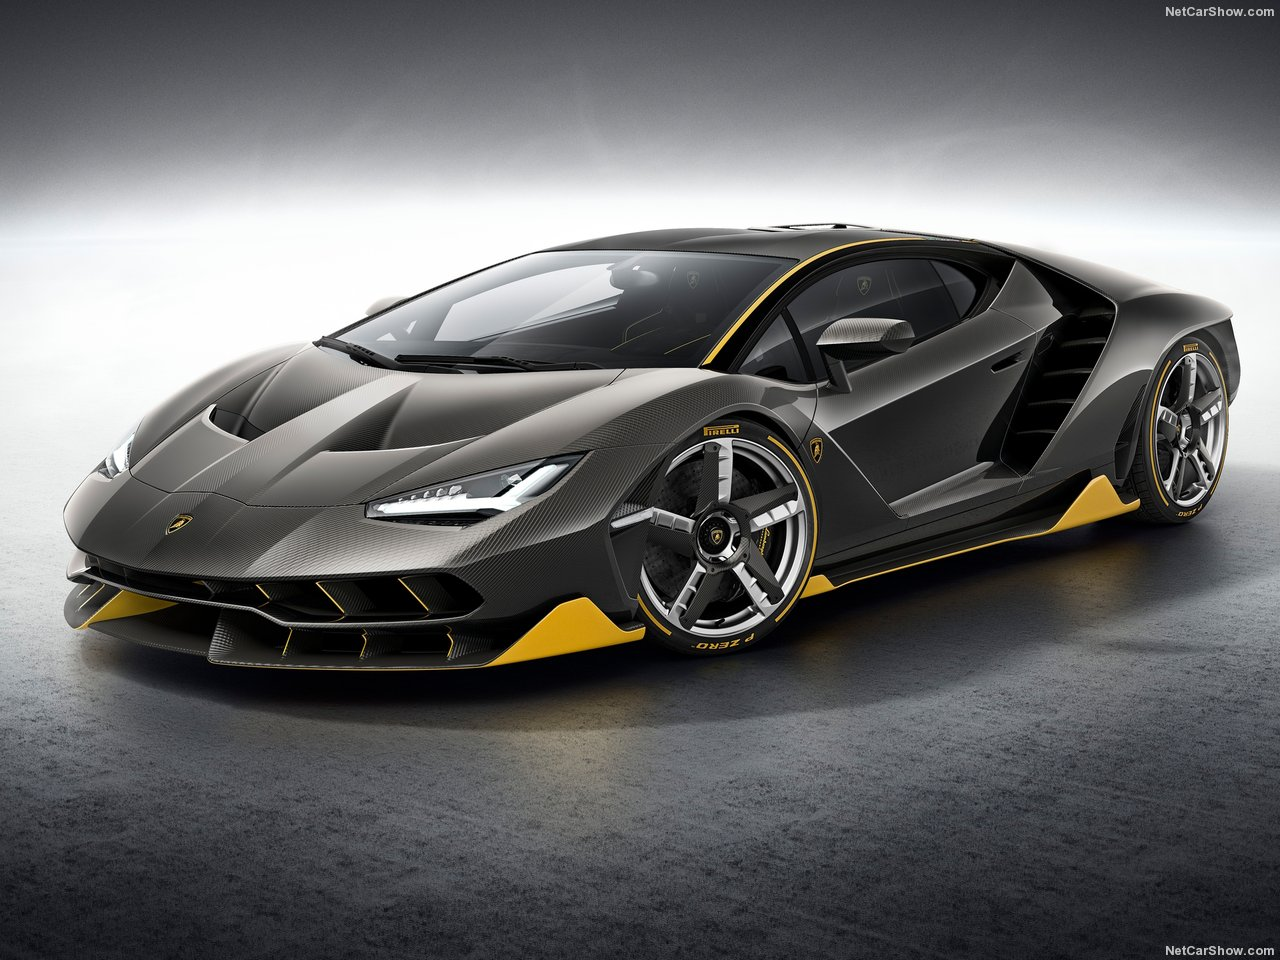 Lamborghini-Centenario_2017_1280x960_wallpaper_02